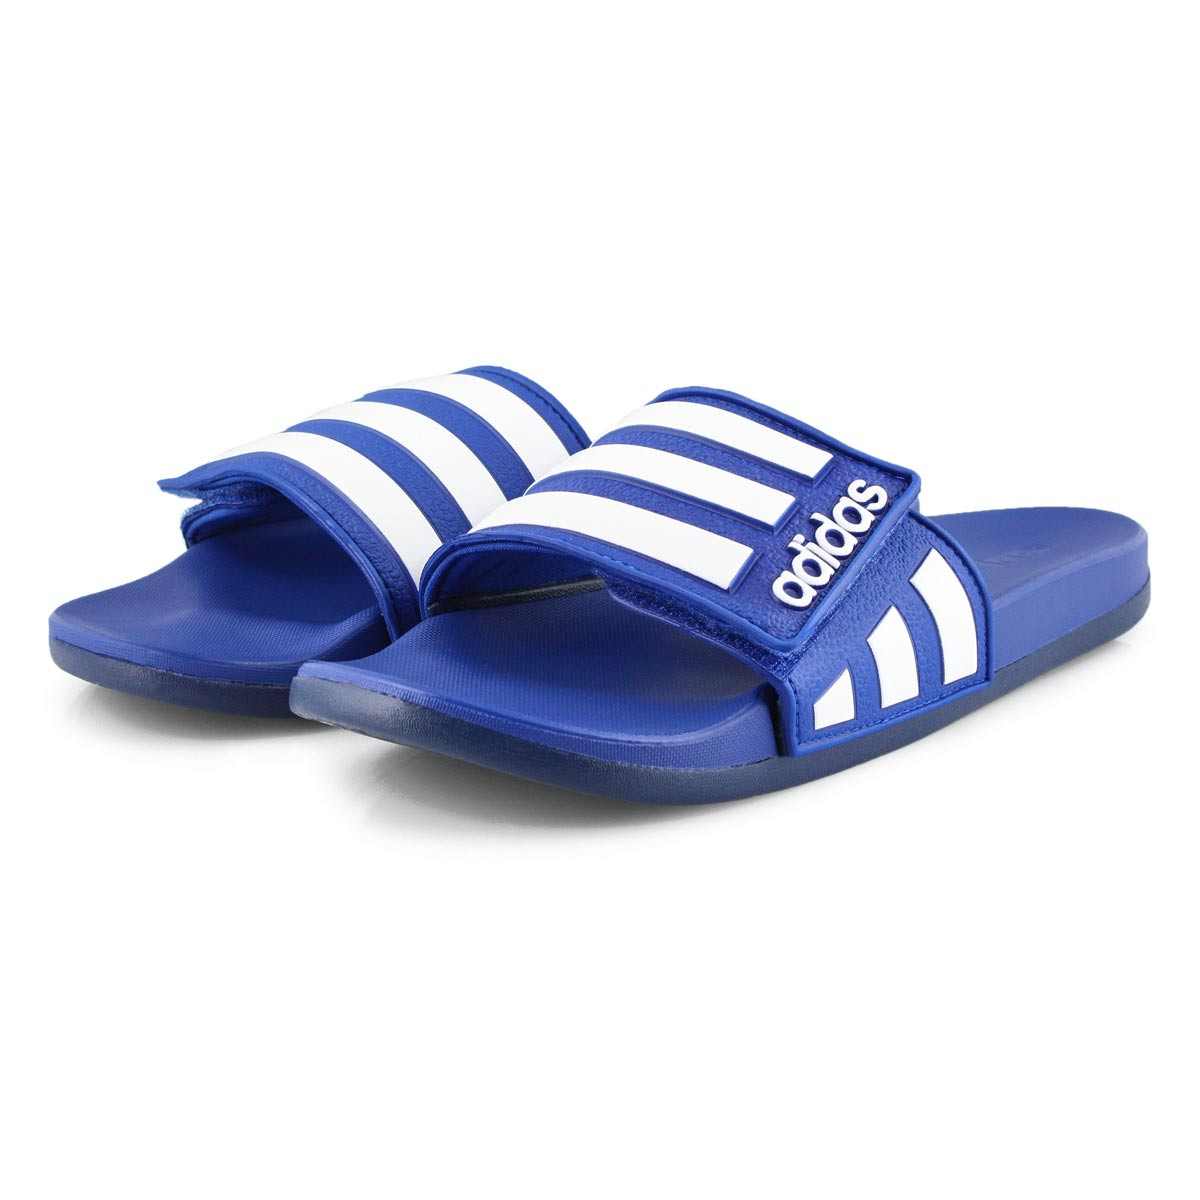 Mns Adilette Comfort ADJ blu/wht sandal